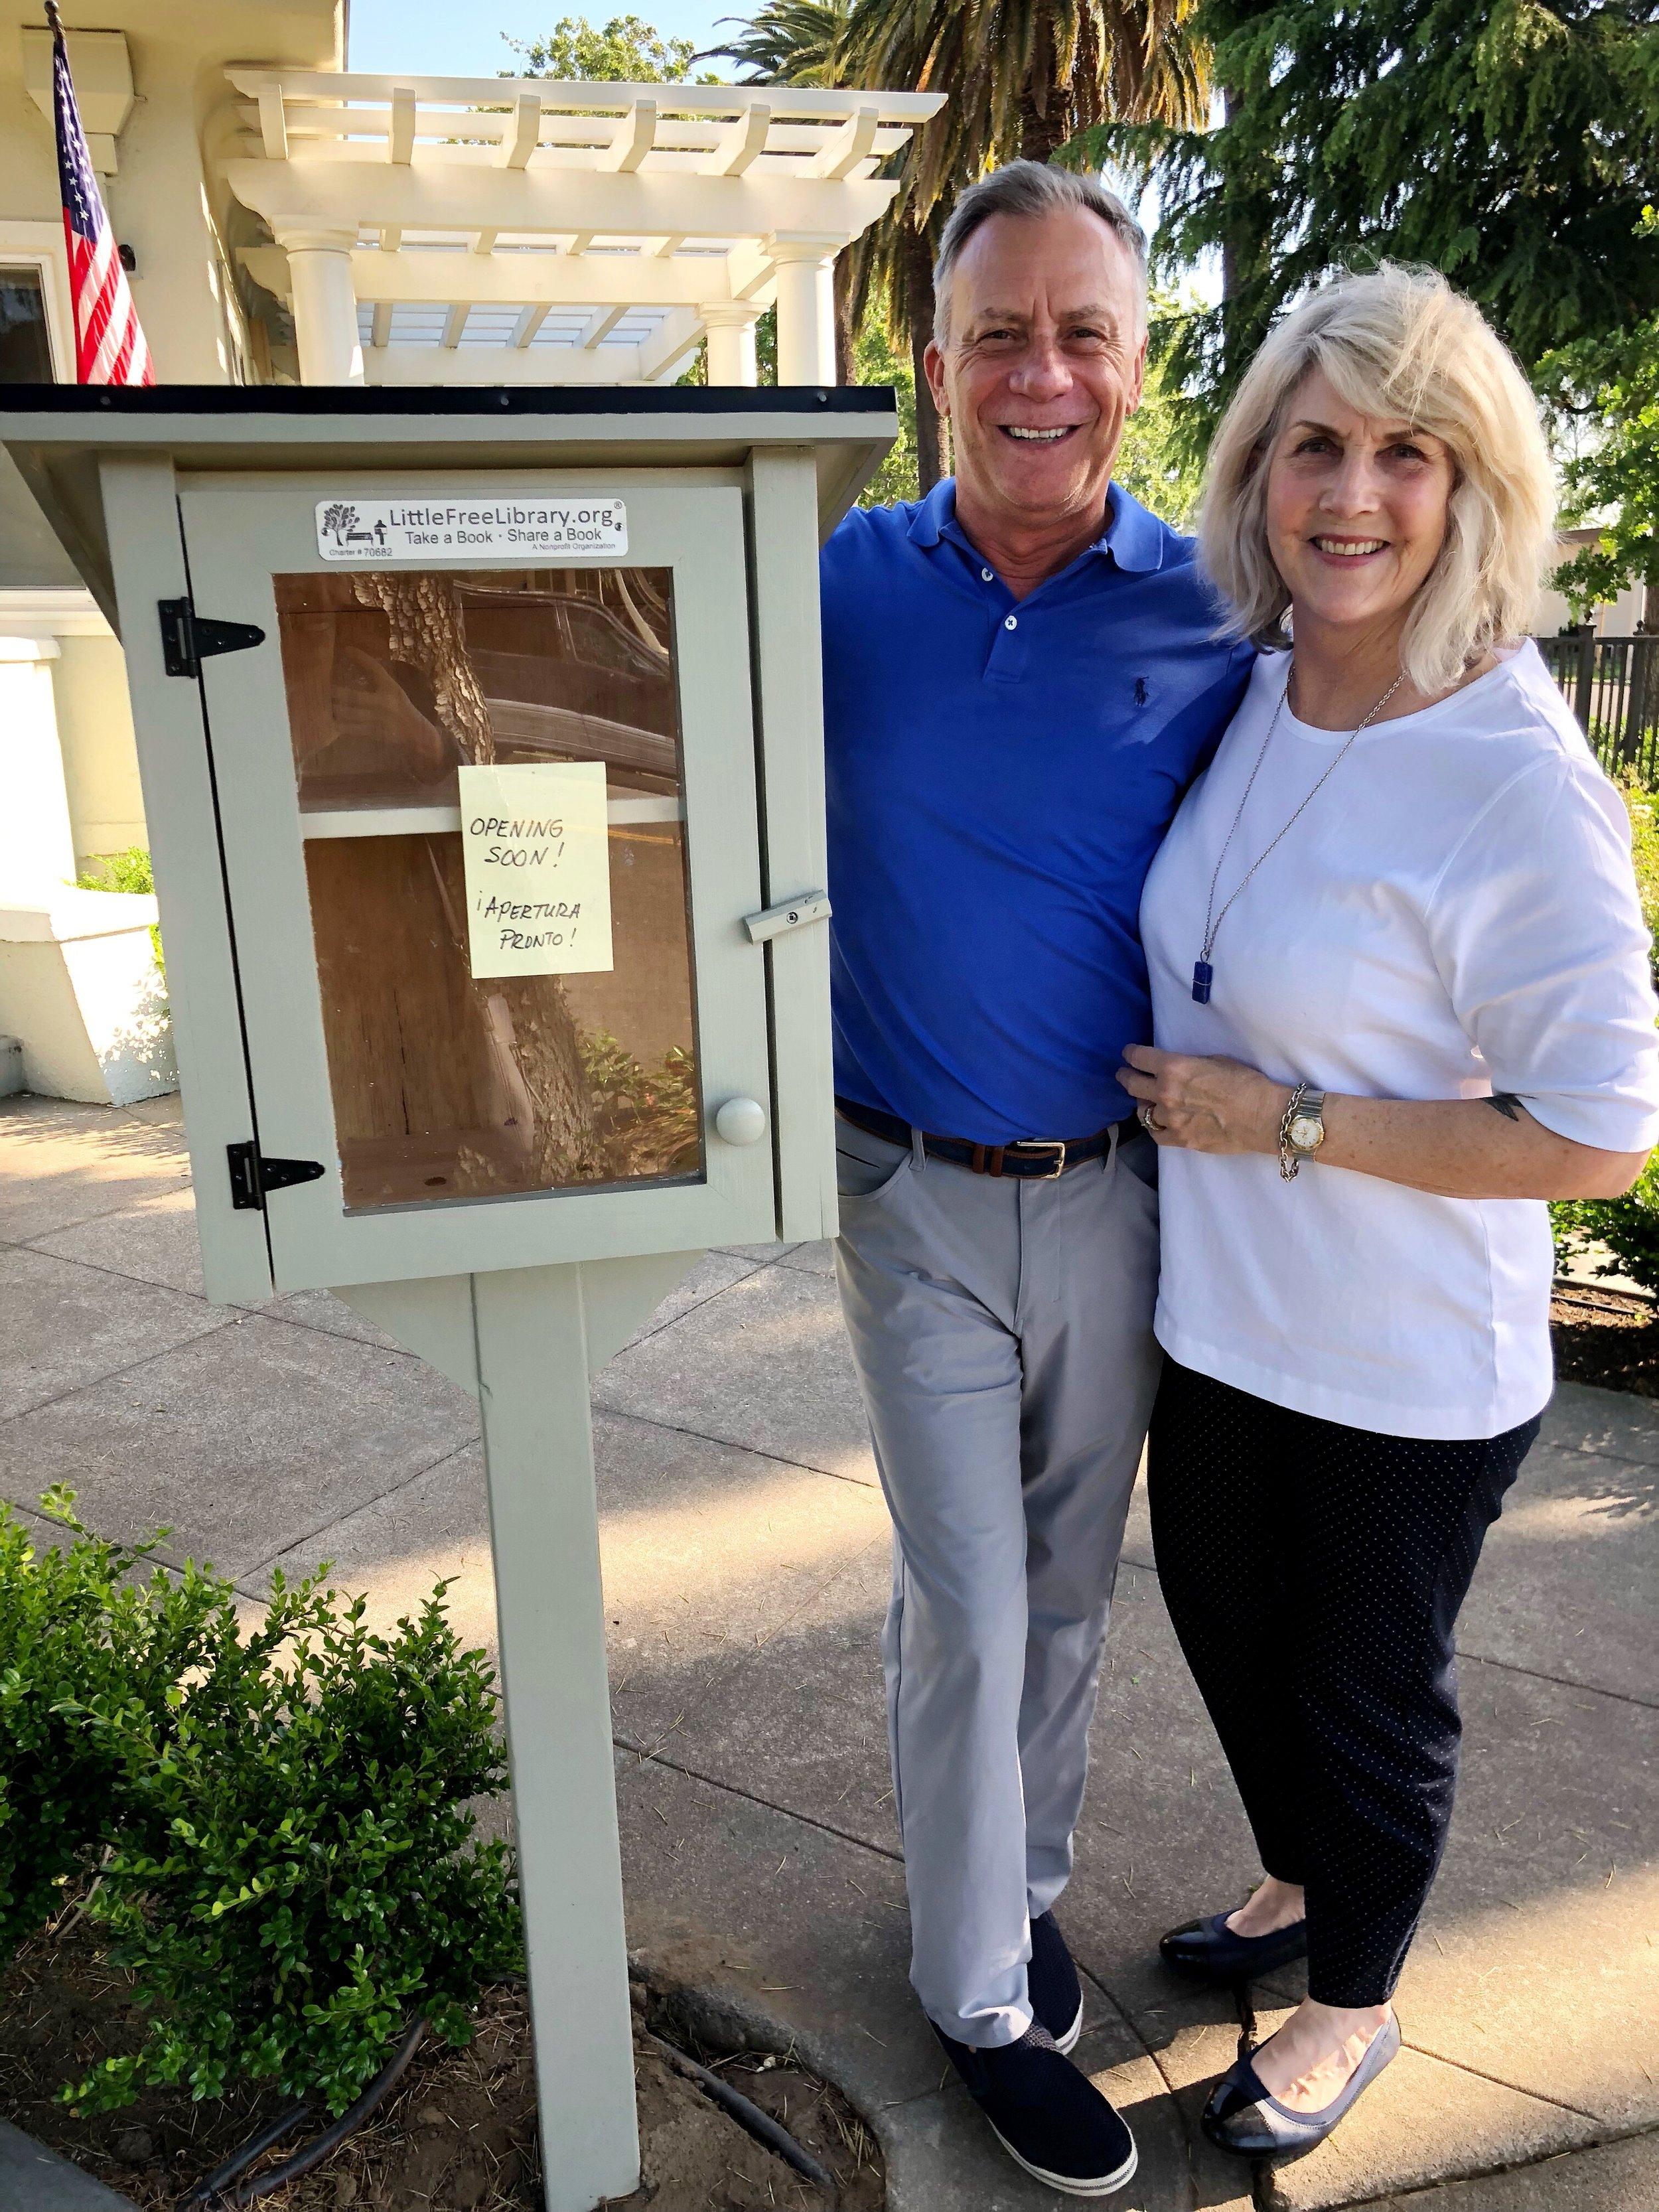 Dave & Virginia Marken next to their Little Free Library